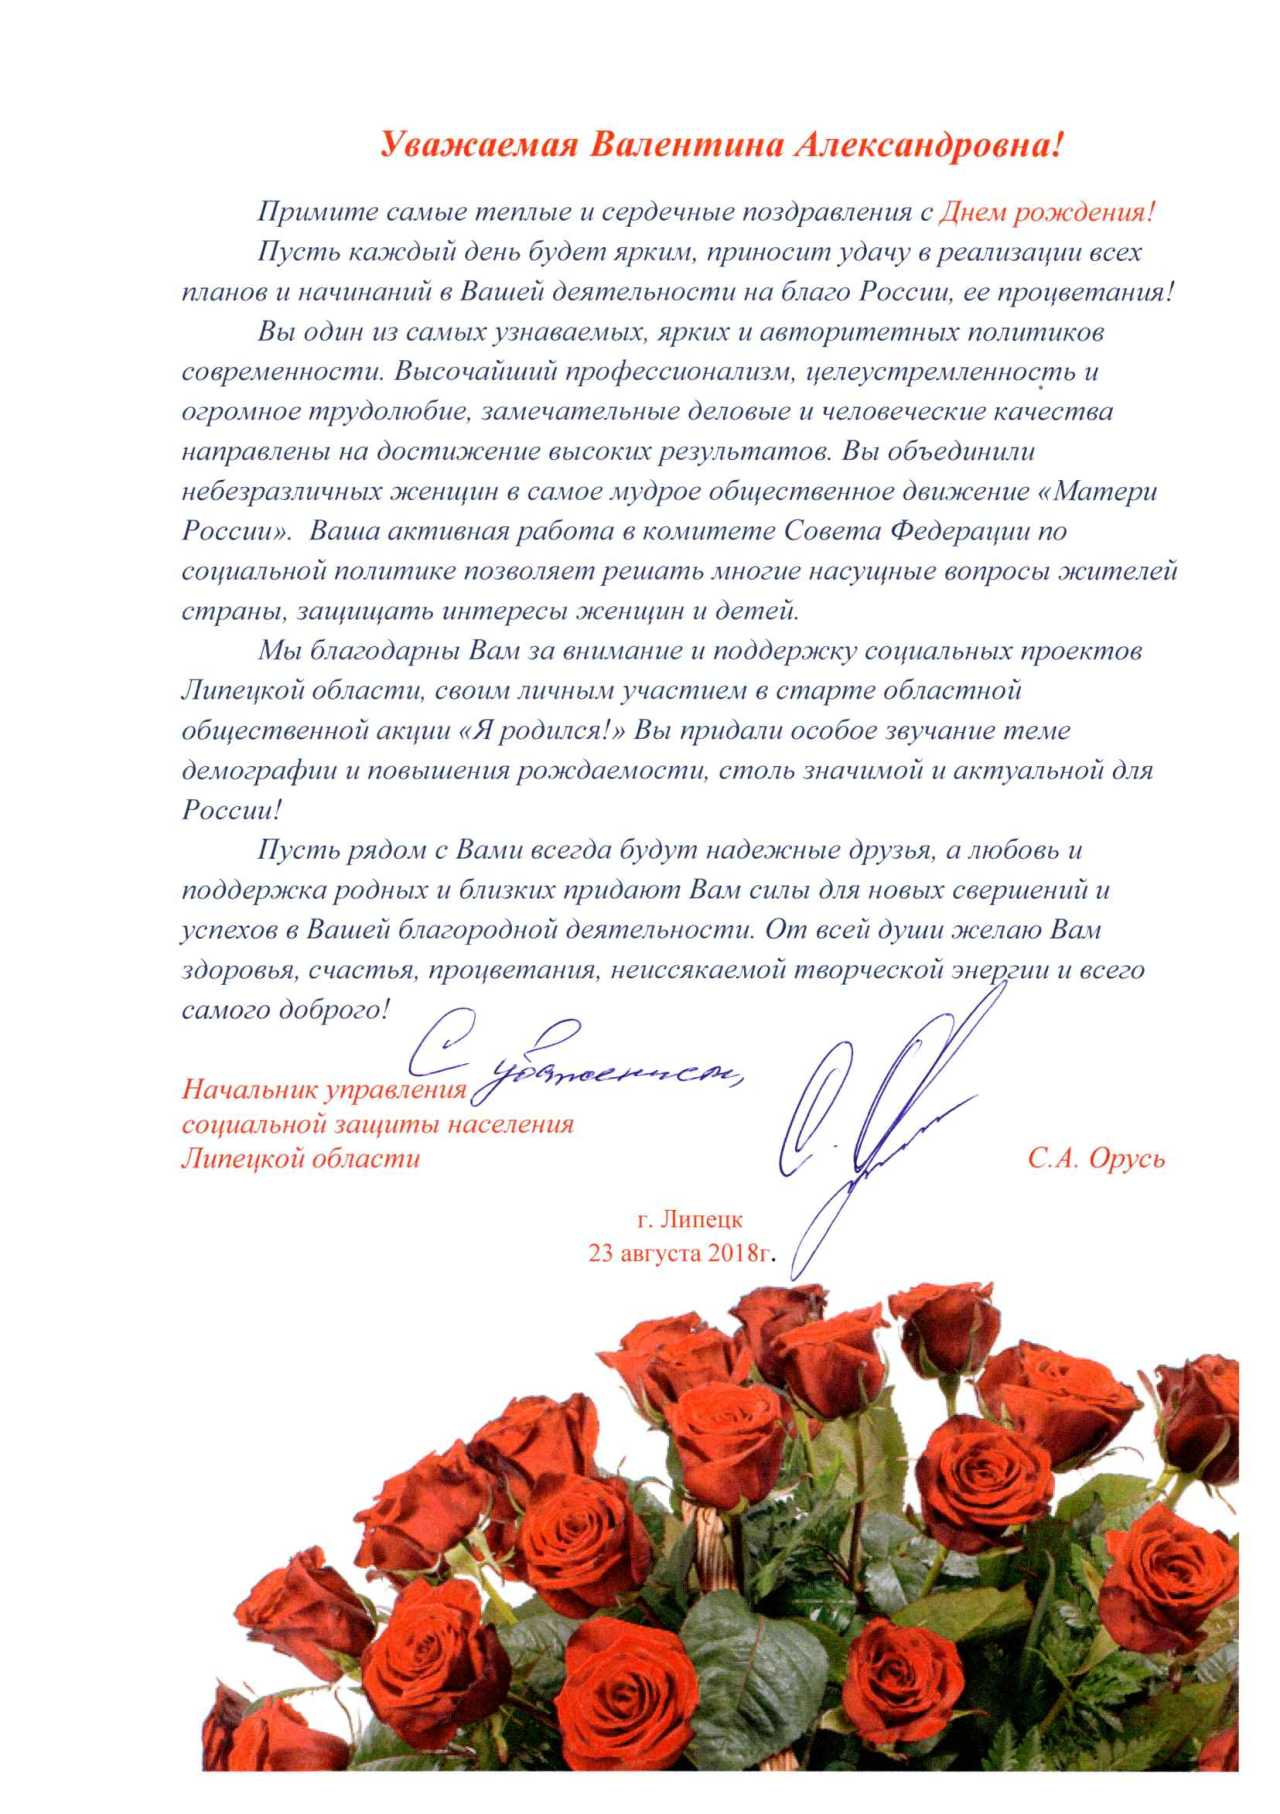 УВАЖАЕМАЯ ВАЛЕНТИНА АЛЕКСАНДРОВНА!